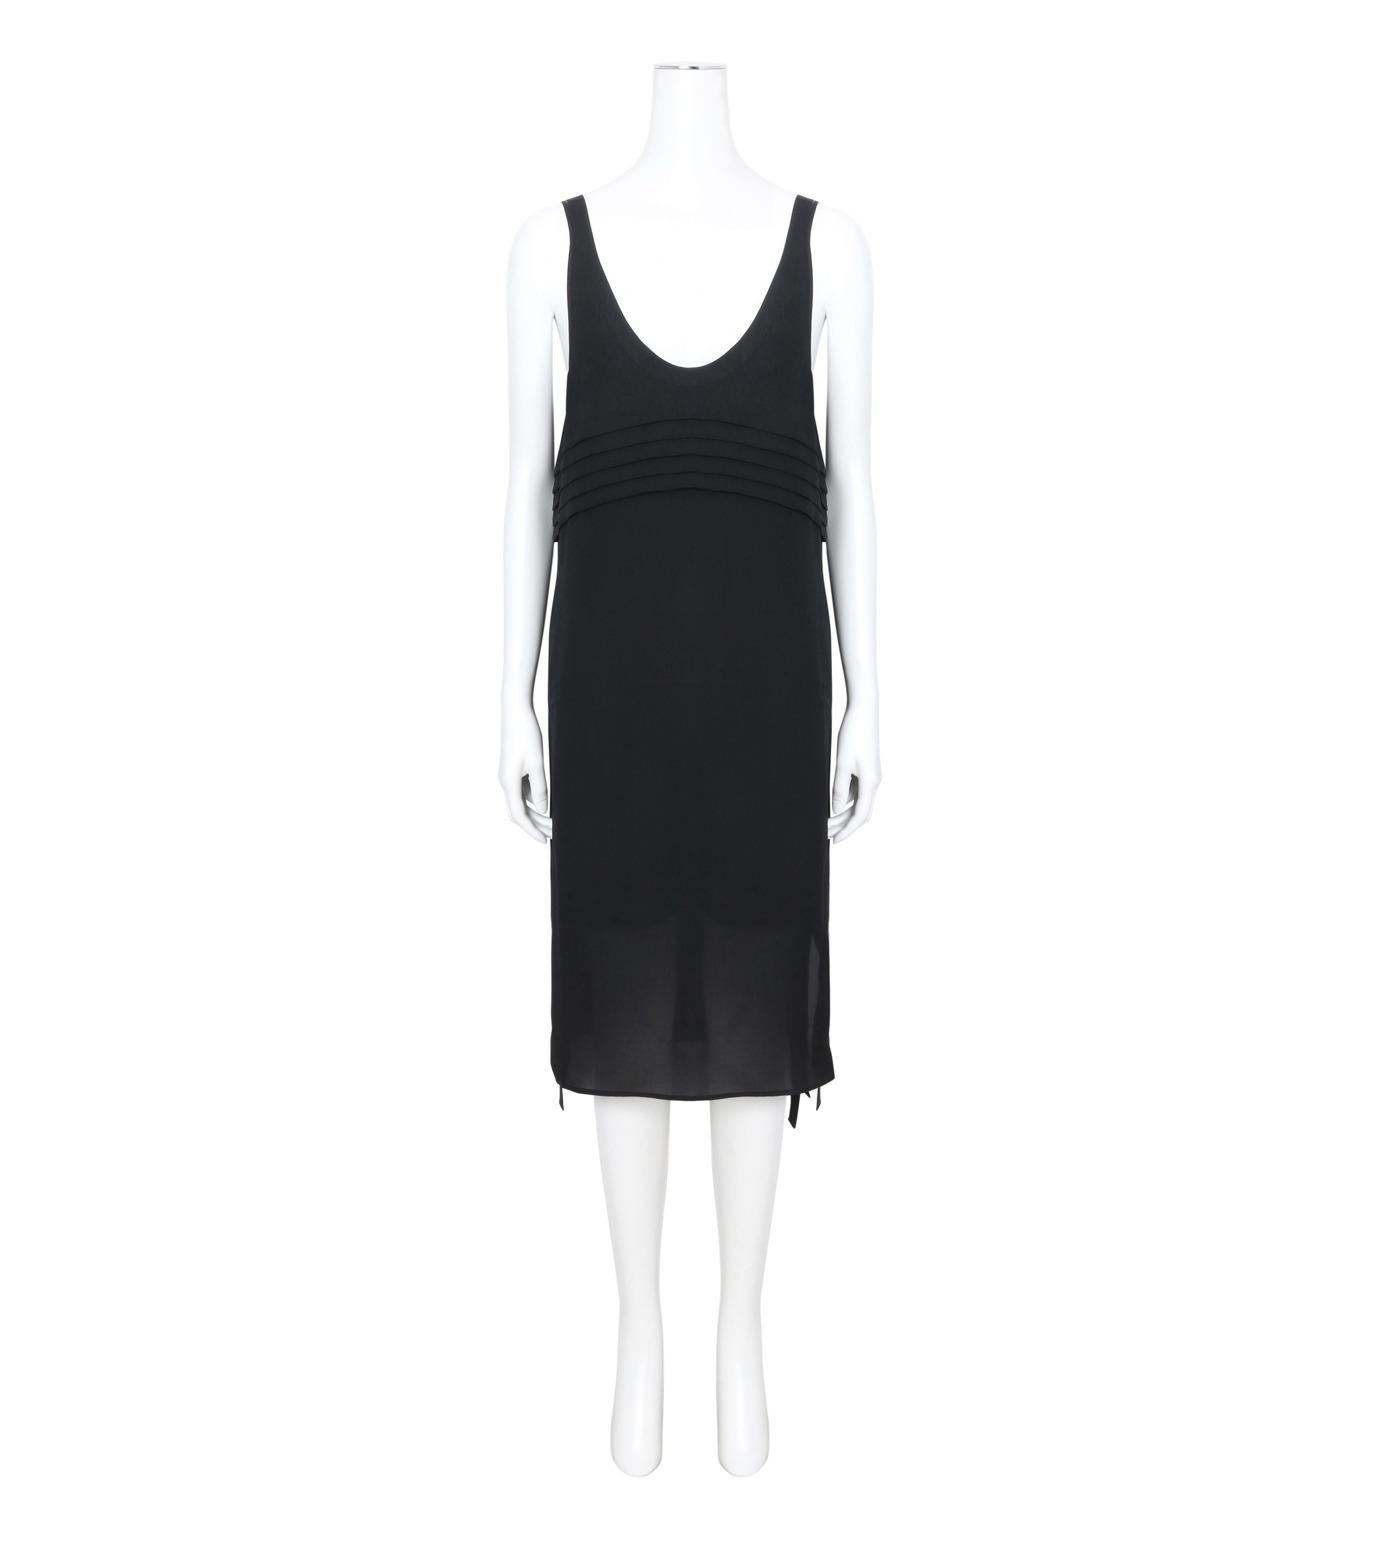 T by Alexander Wang(ティーバイ アレキサンダーワン)のPleated Front Tie Tank Dress-BLACK(ワンピース/one piece)-403417R17-13 拡大詳細画像1